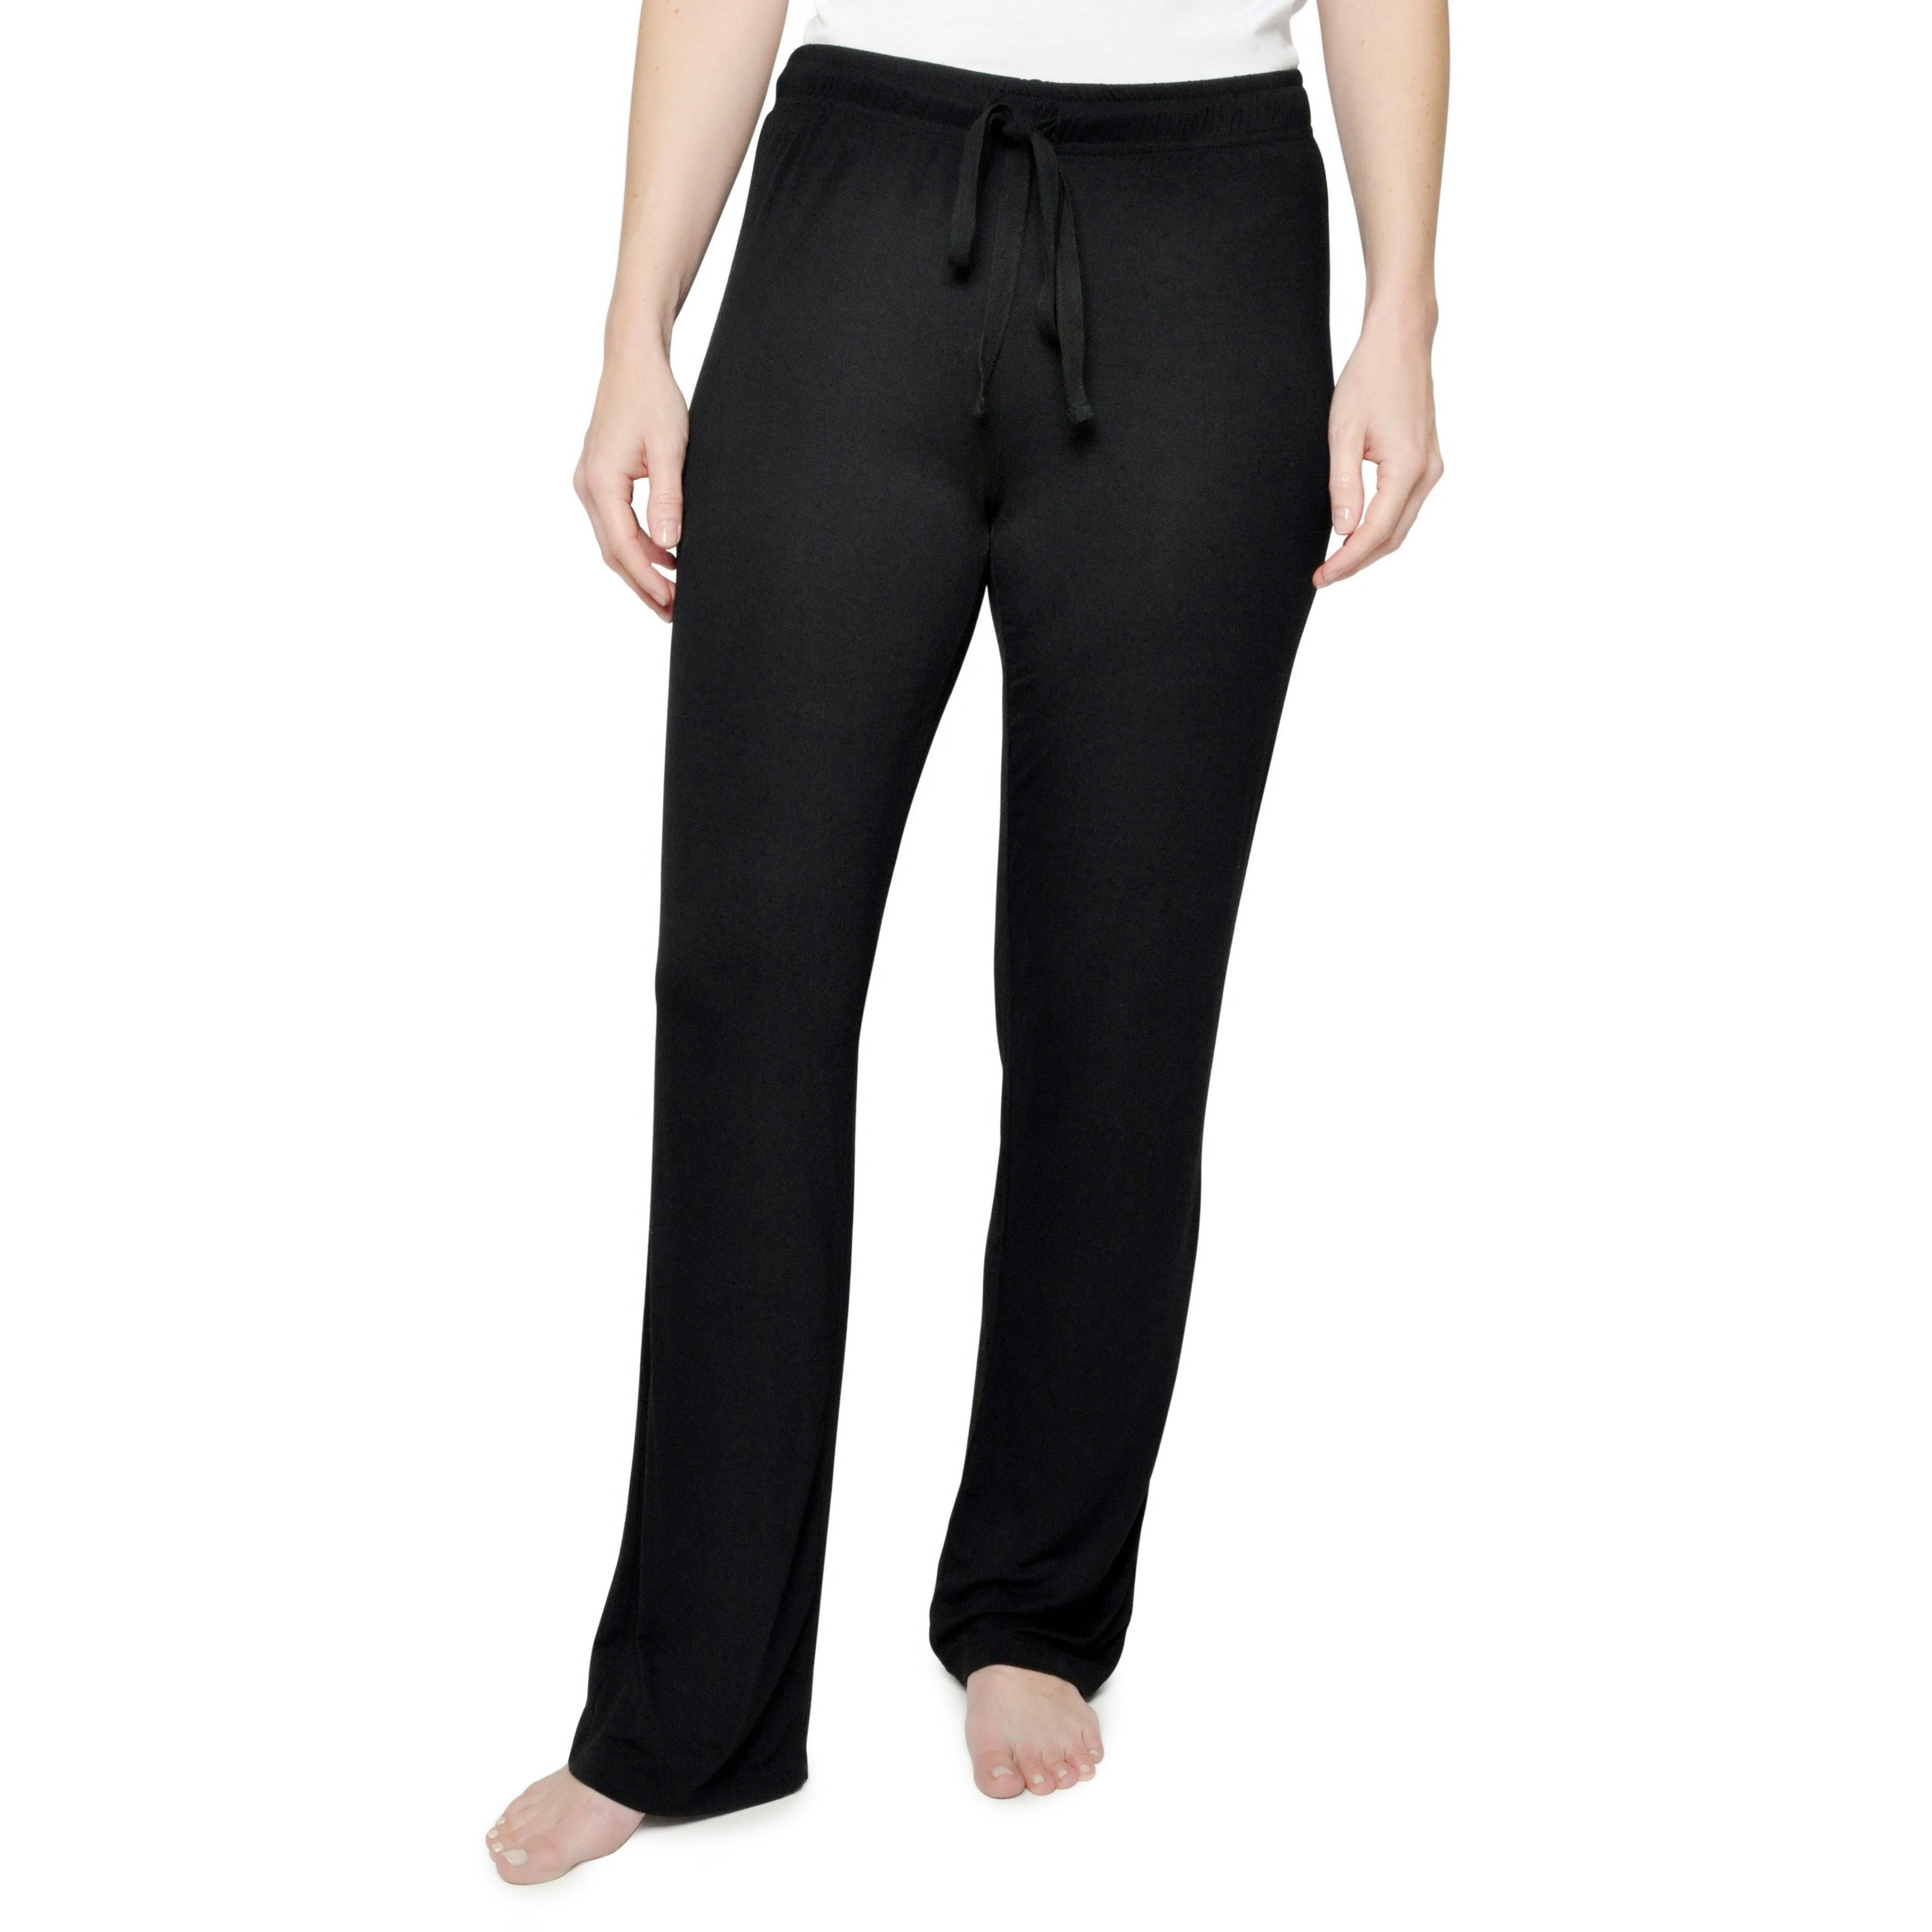 b298b1a8851 6 pairs Semi Sheer TAN Thigh High Hi Stockings Nylons Hosiery OLD FASHION  TAN Thigh Sheer